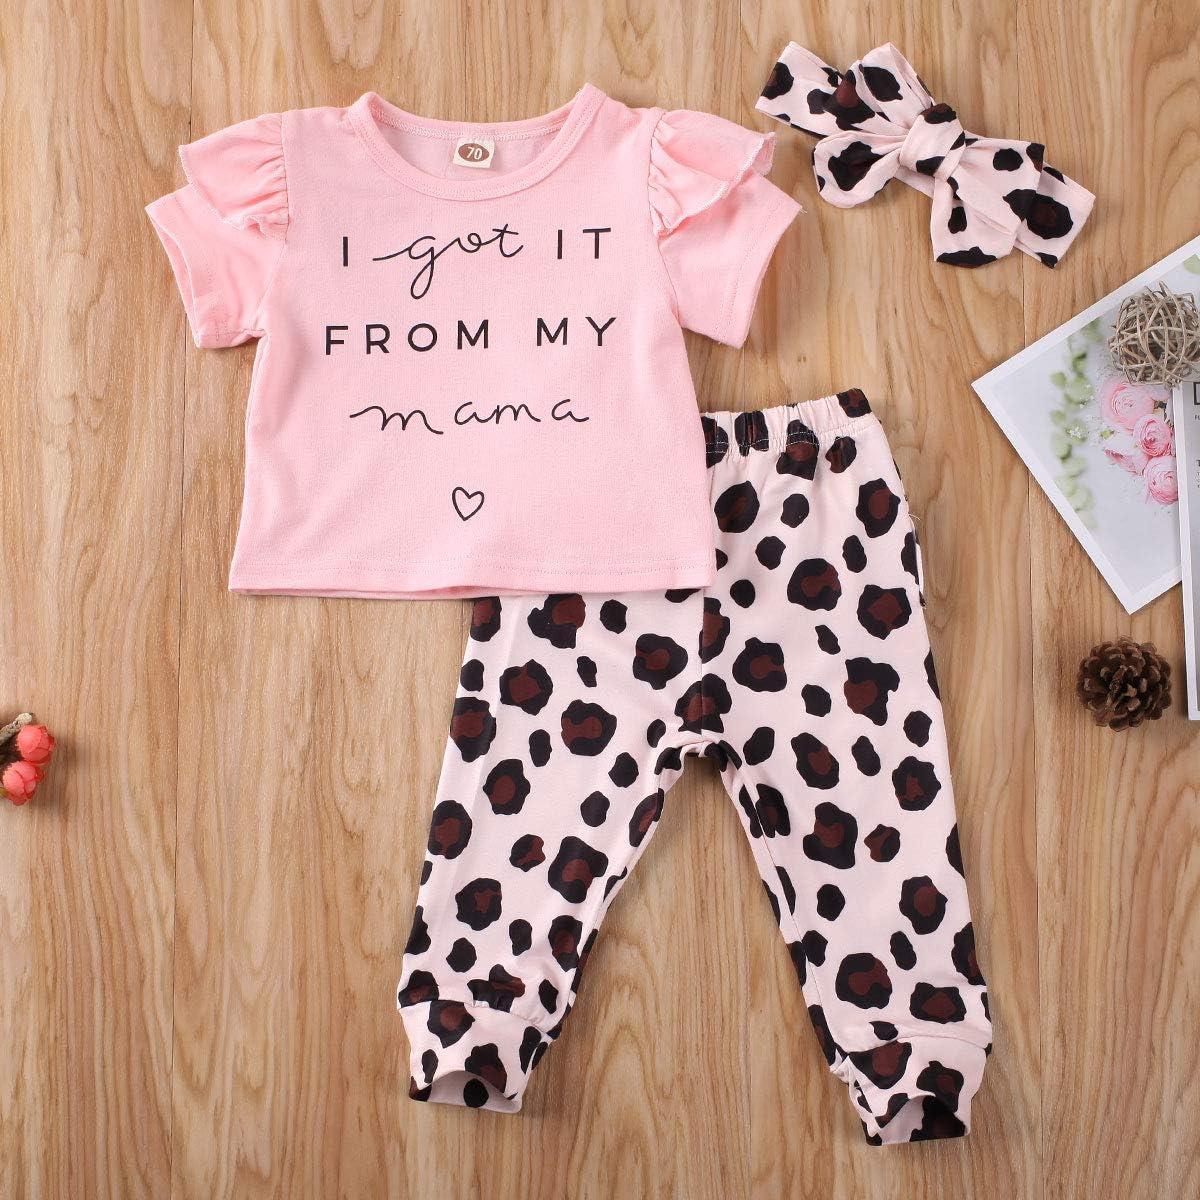 lheaio Newborn Baby Girls I Got It from My Mama Ruffle Short Sleeve T-Shirt Tops Leopard Pants Headband Clothes Sets